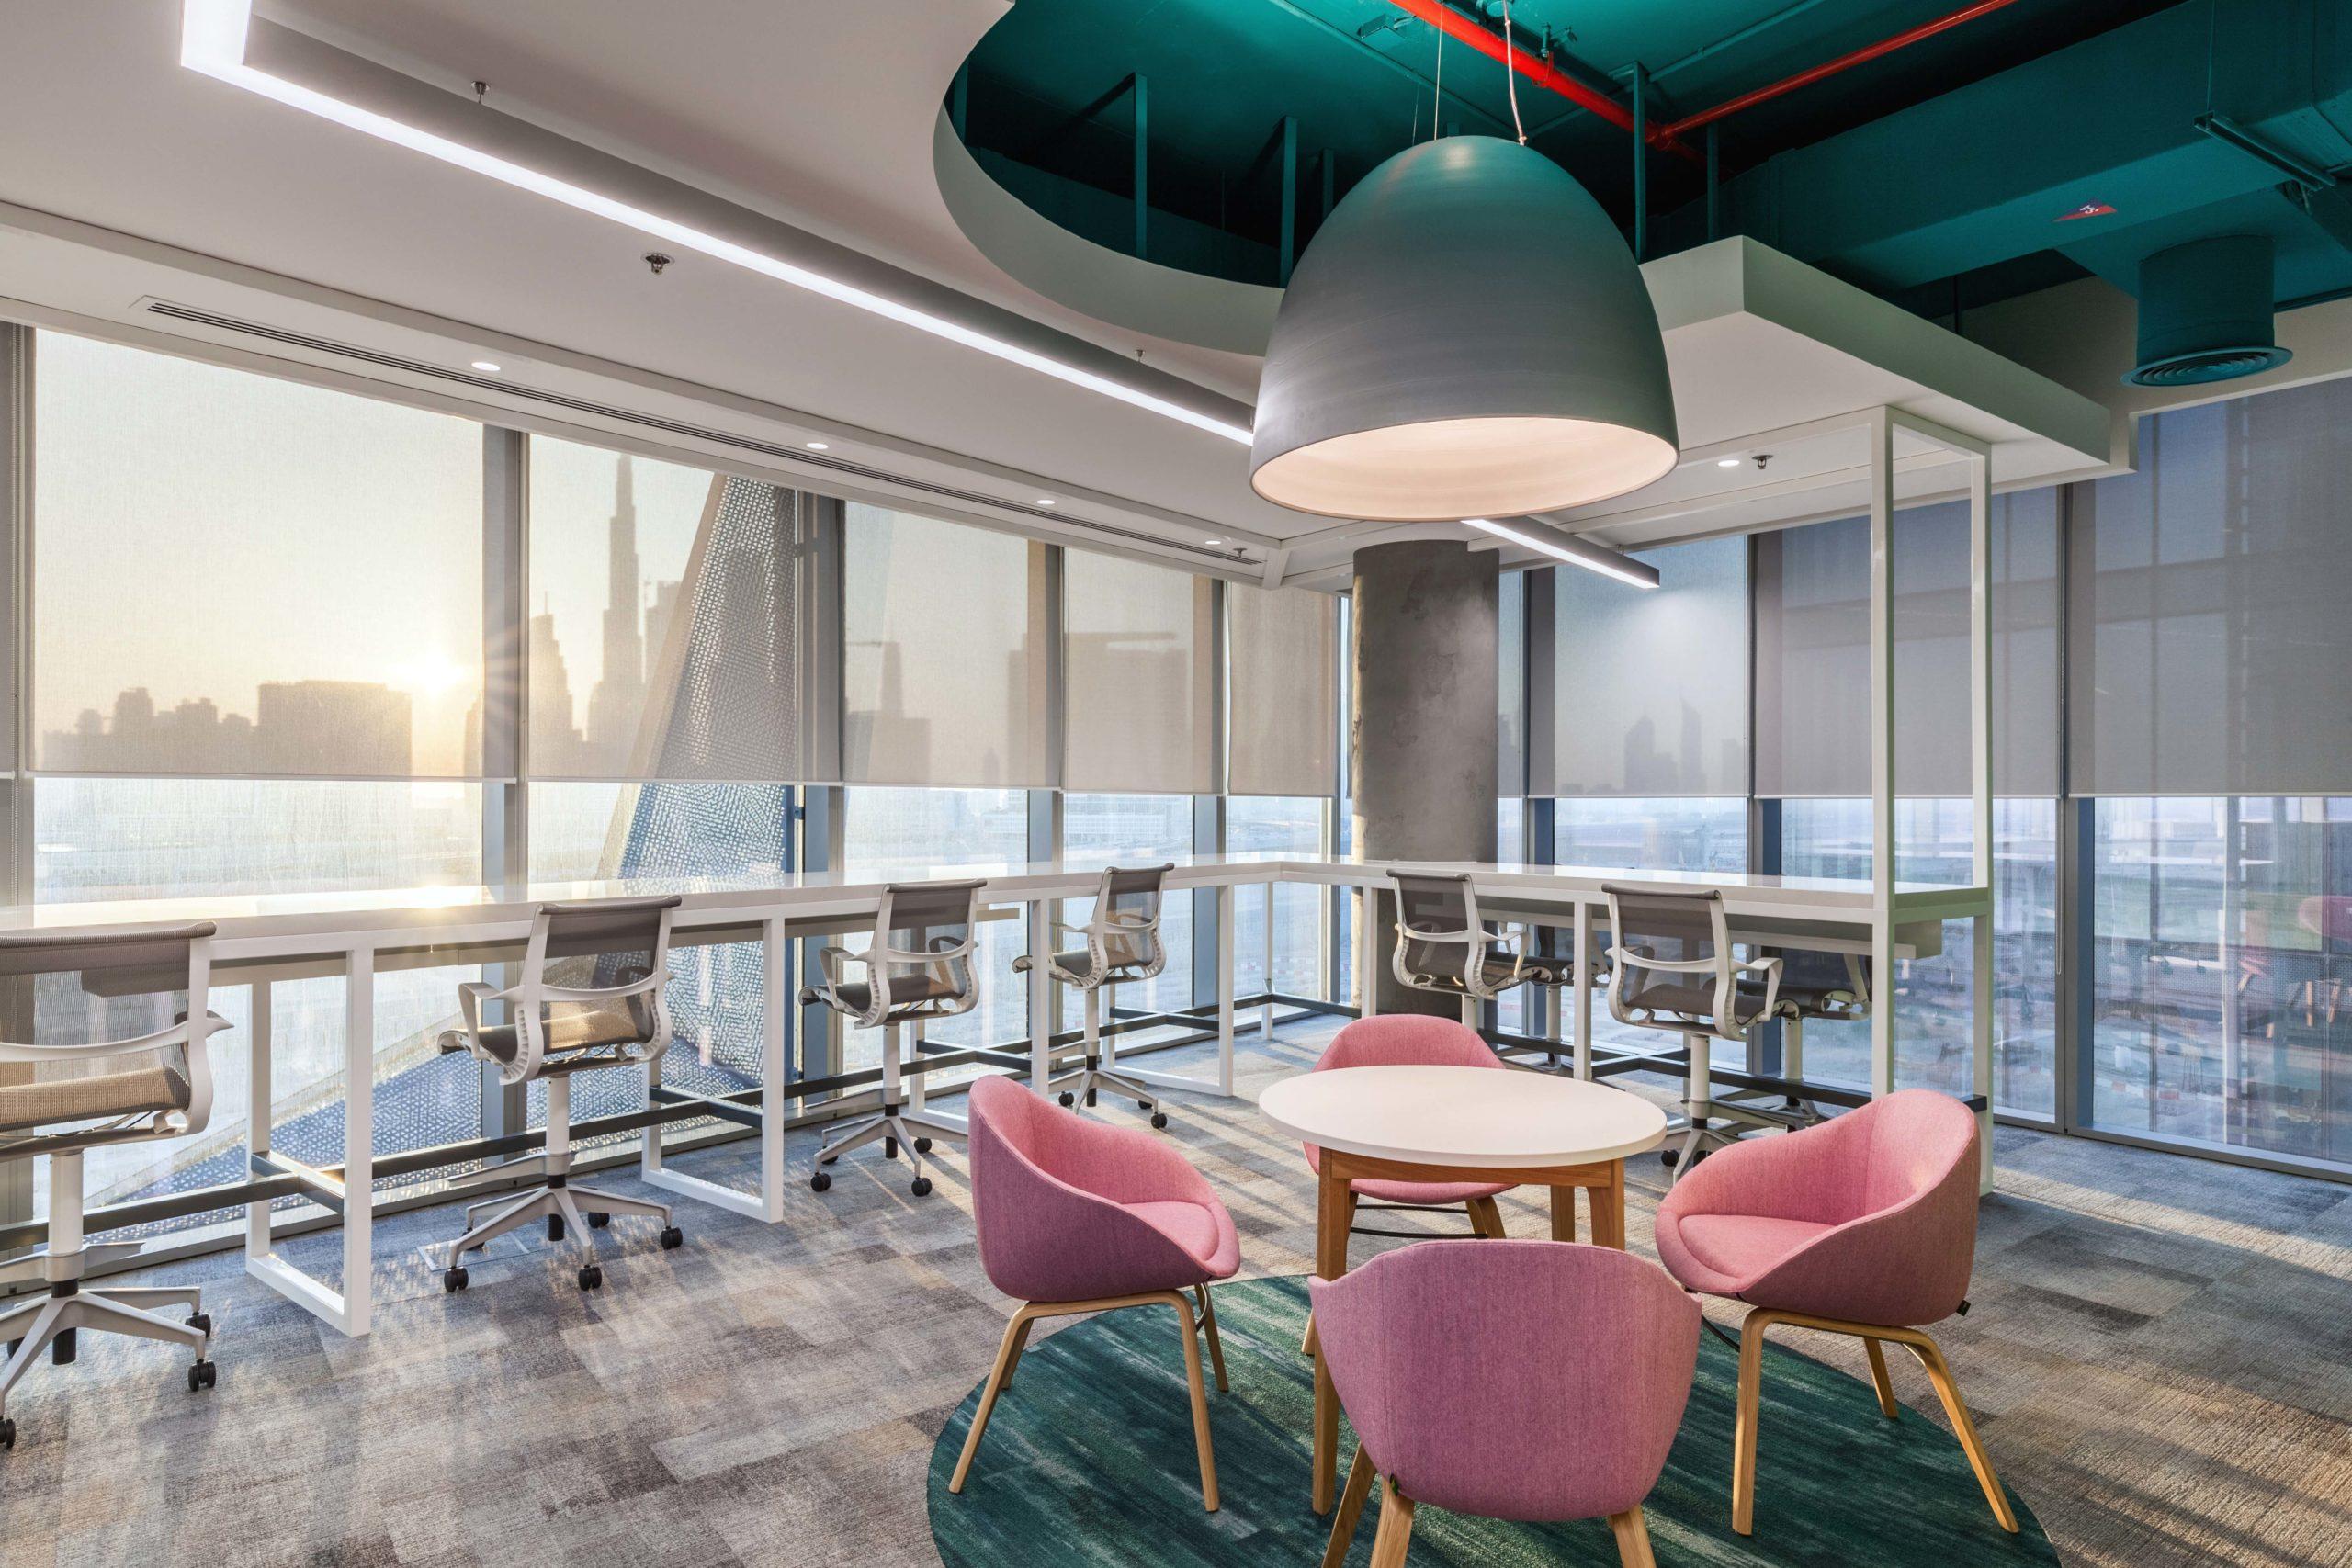 Design & Build Contractors, Interiors/Fit-out Contractors in Dubai